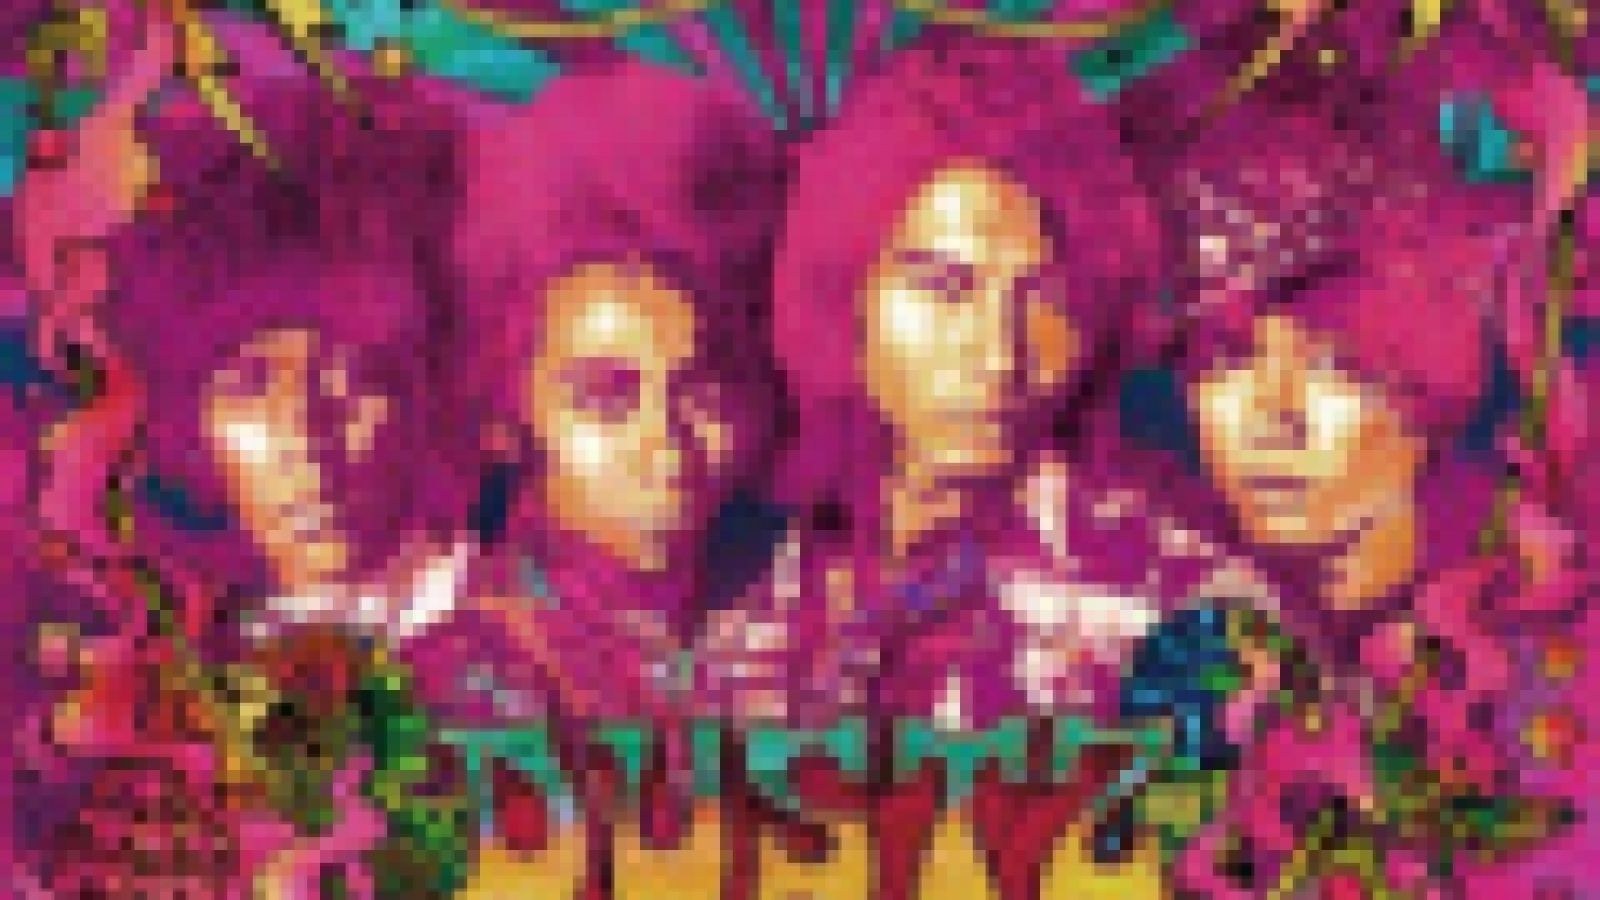 Nowe single DUSTZ, 9mm Parabellum Bullet i TOKYO MICHAEL © Dustz - Epic Records Japan